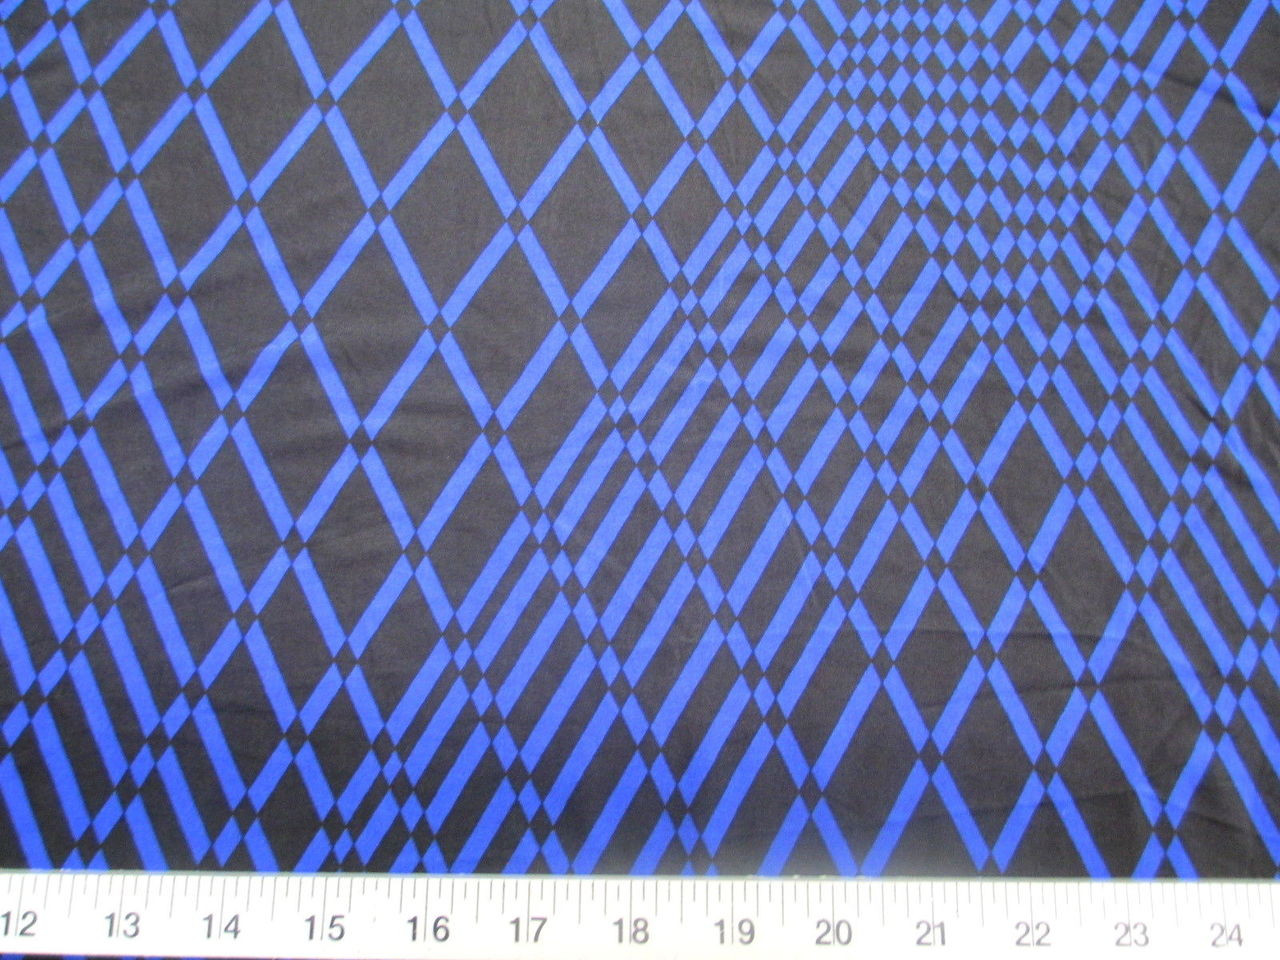 Discount Fabric Printed Lycra Spandex Stretch Royal Blue Geometric Diamonds B300